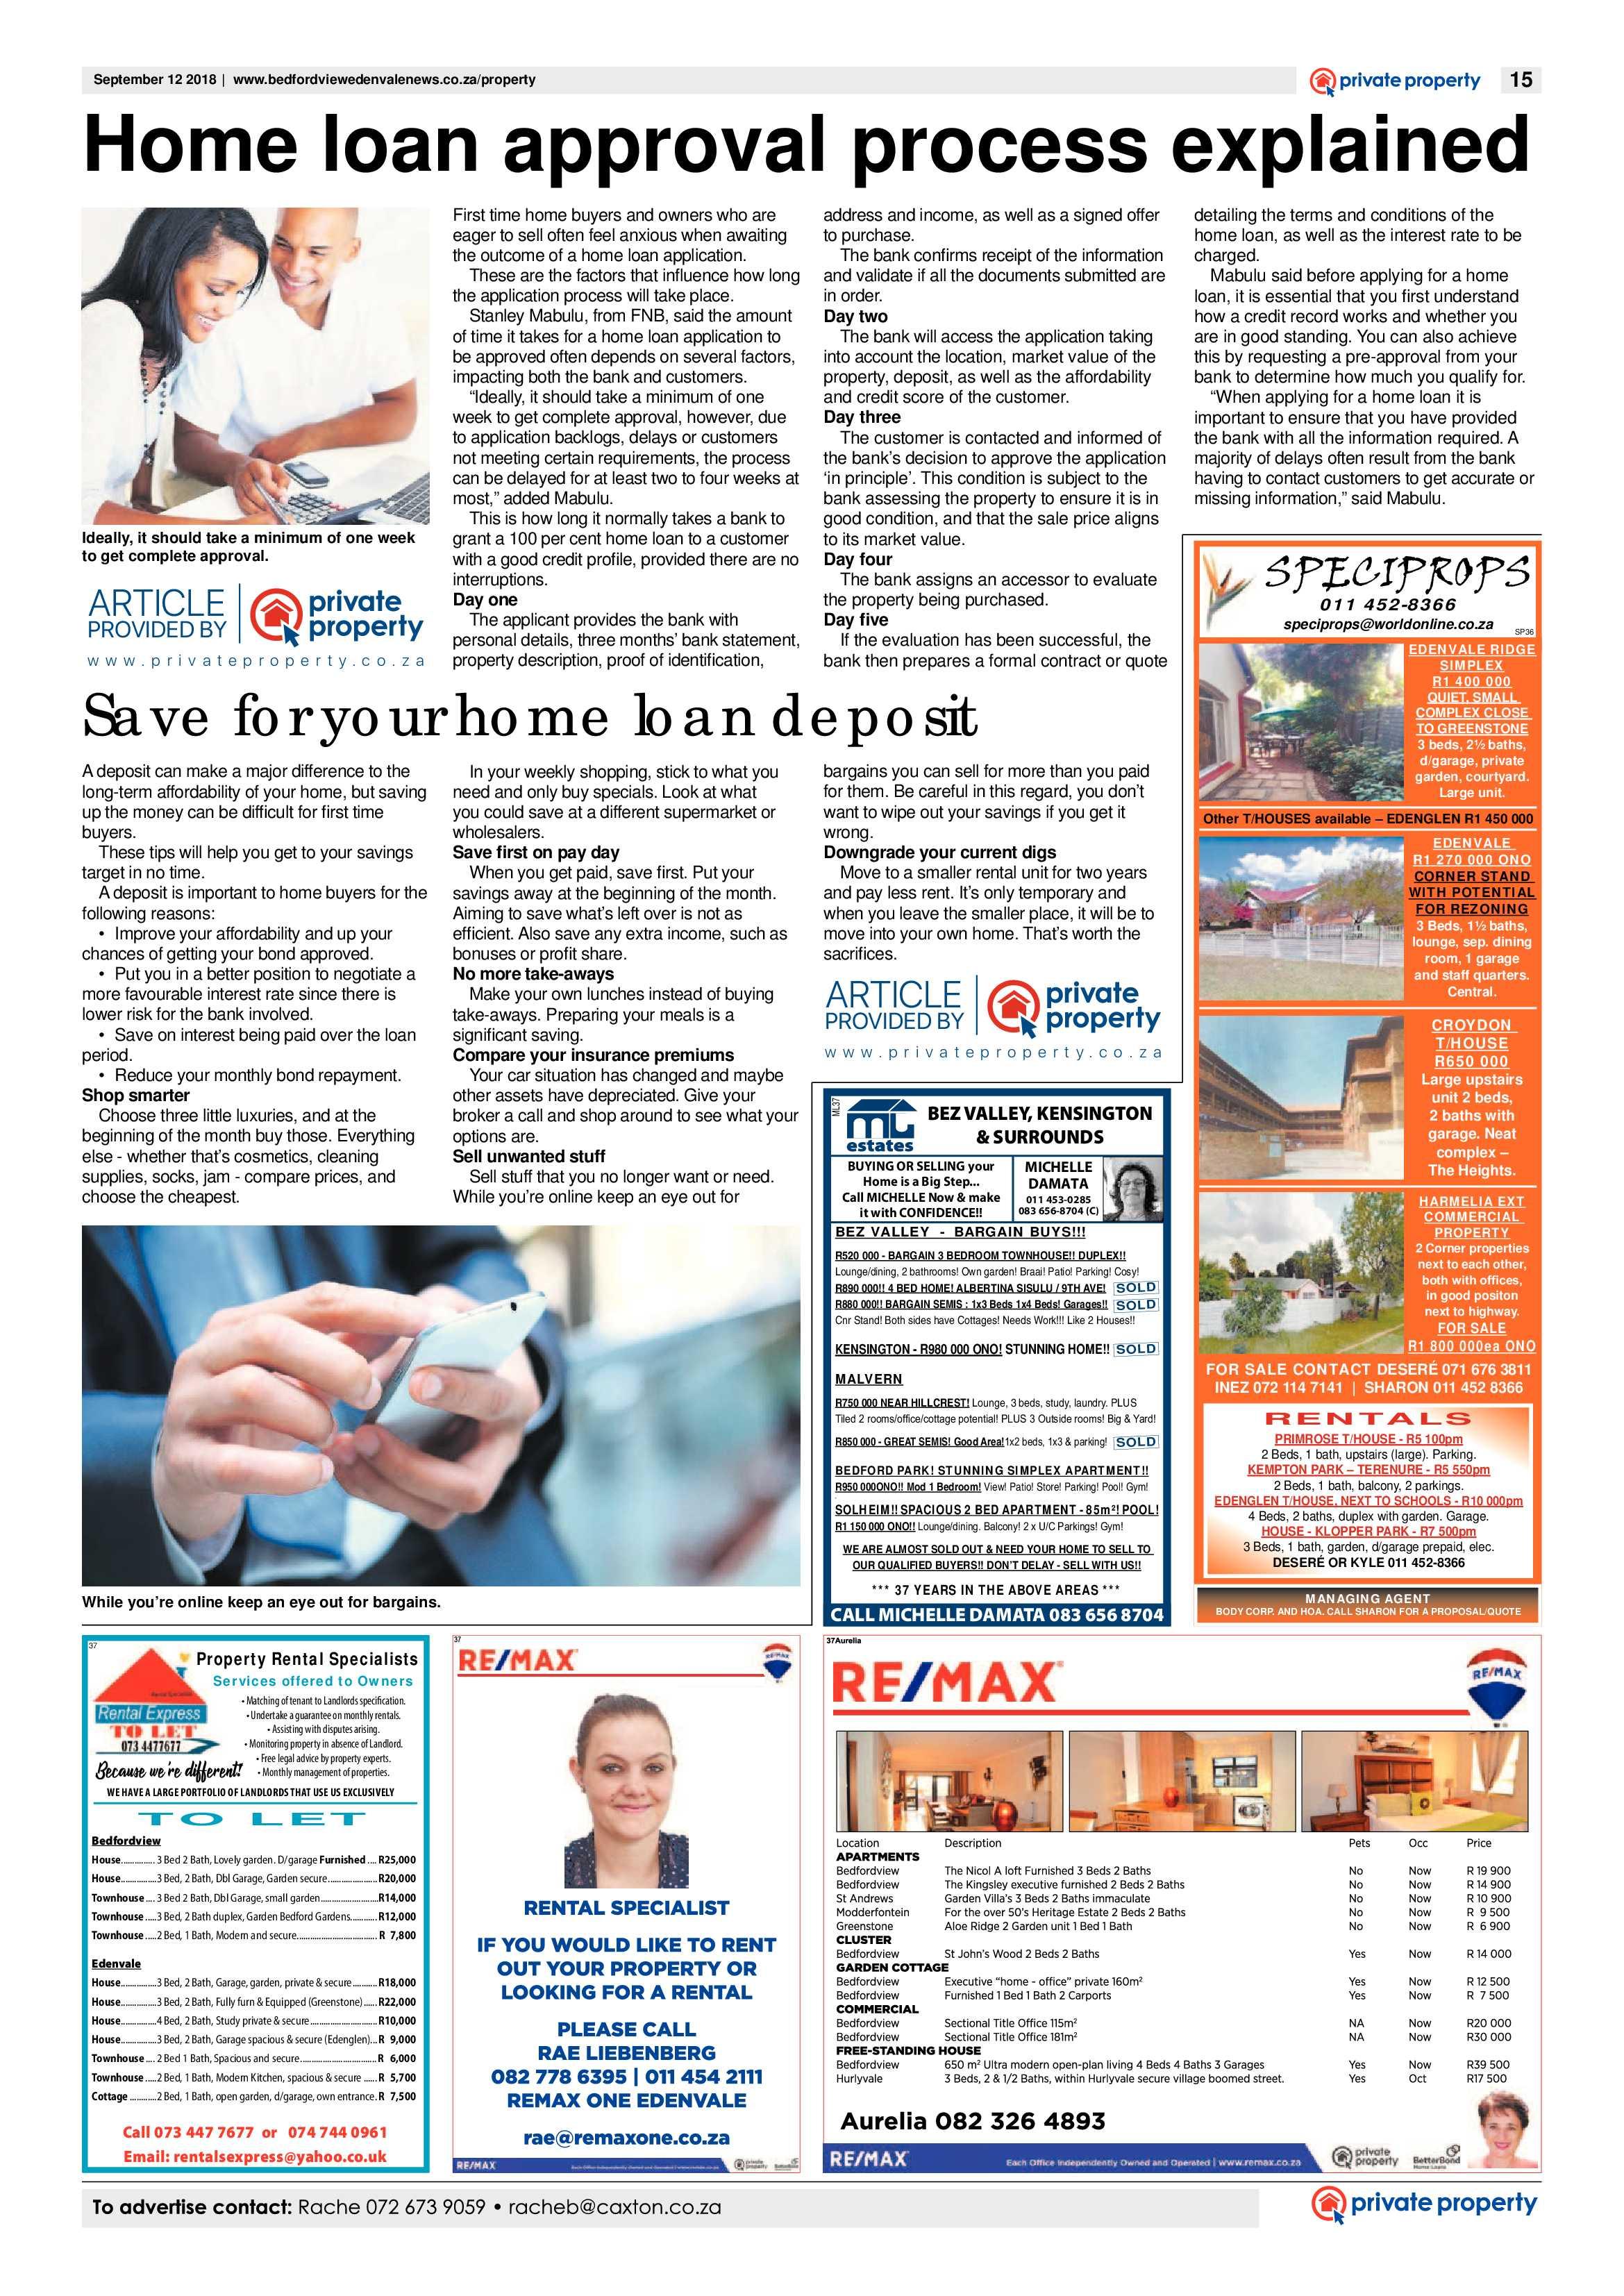 bedford-edenvale-12-september-2018-epapers-page-15